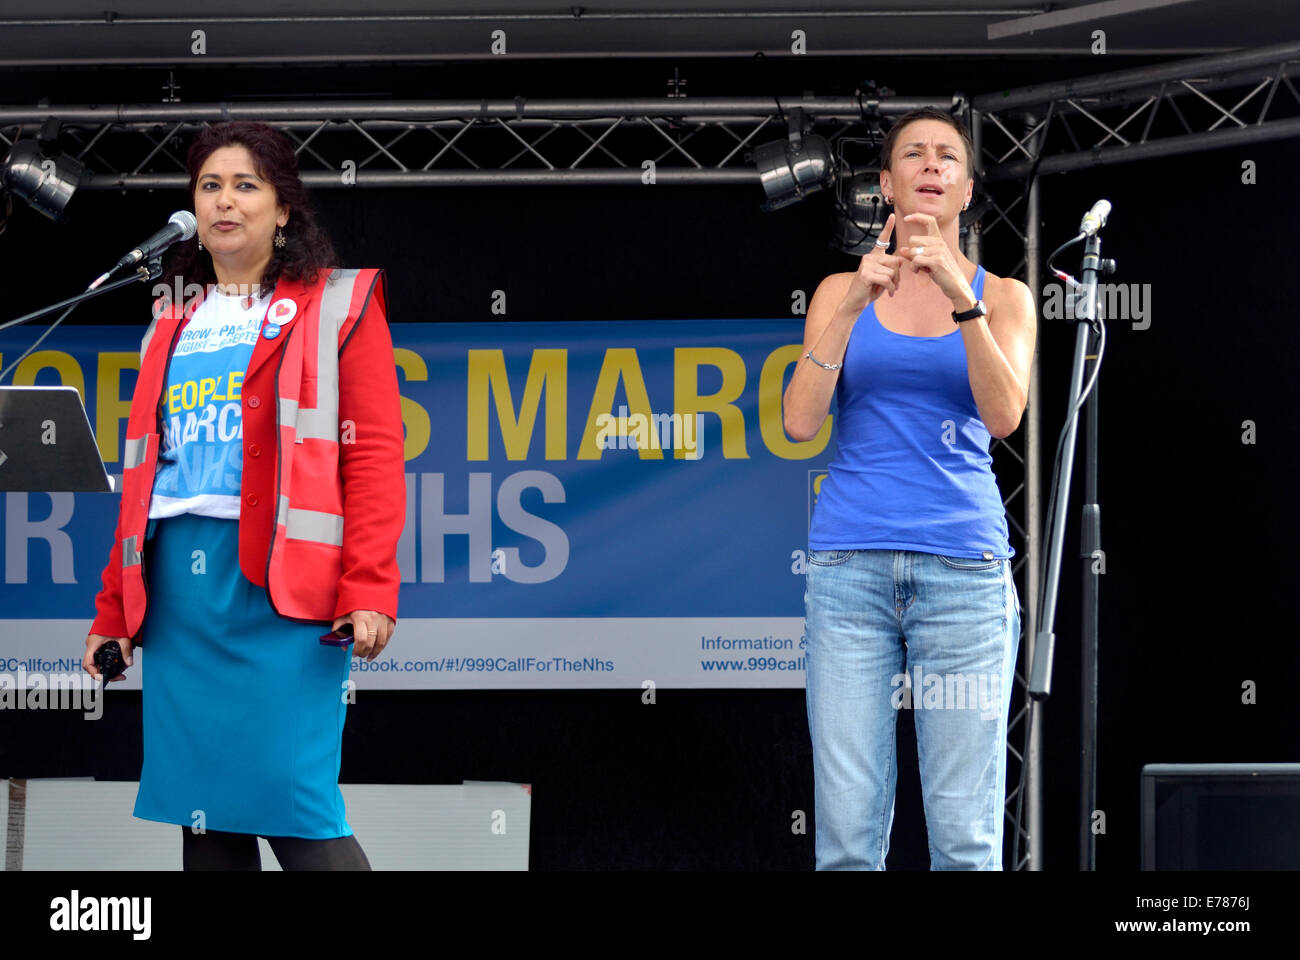 Sign Language interpreter at a political rally in Trafalgar Square - Stock Image